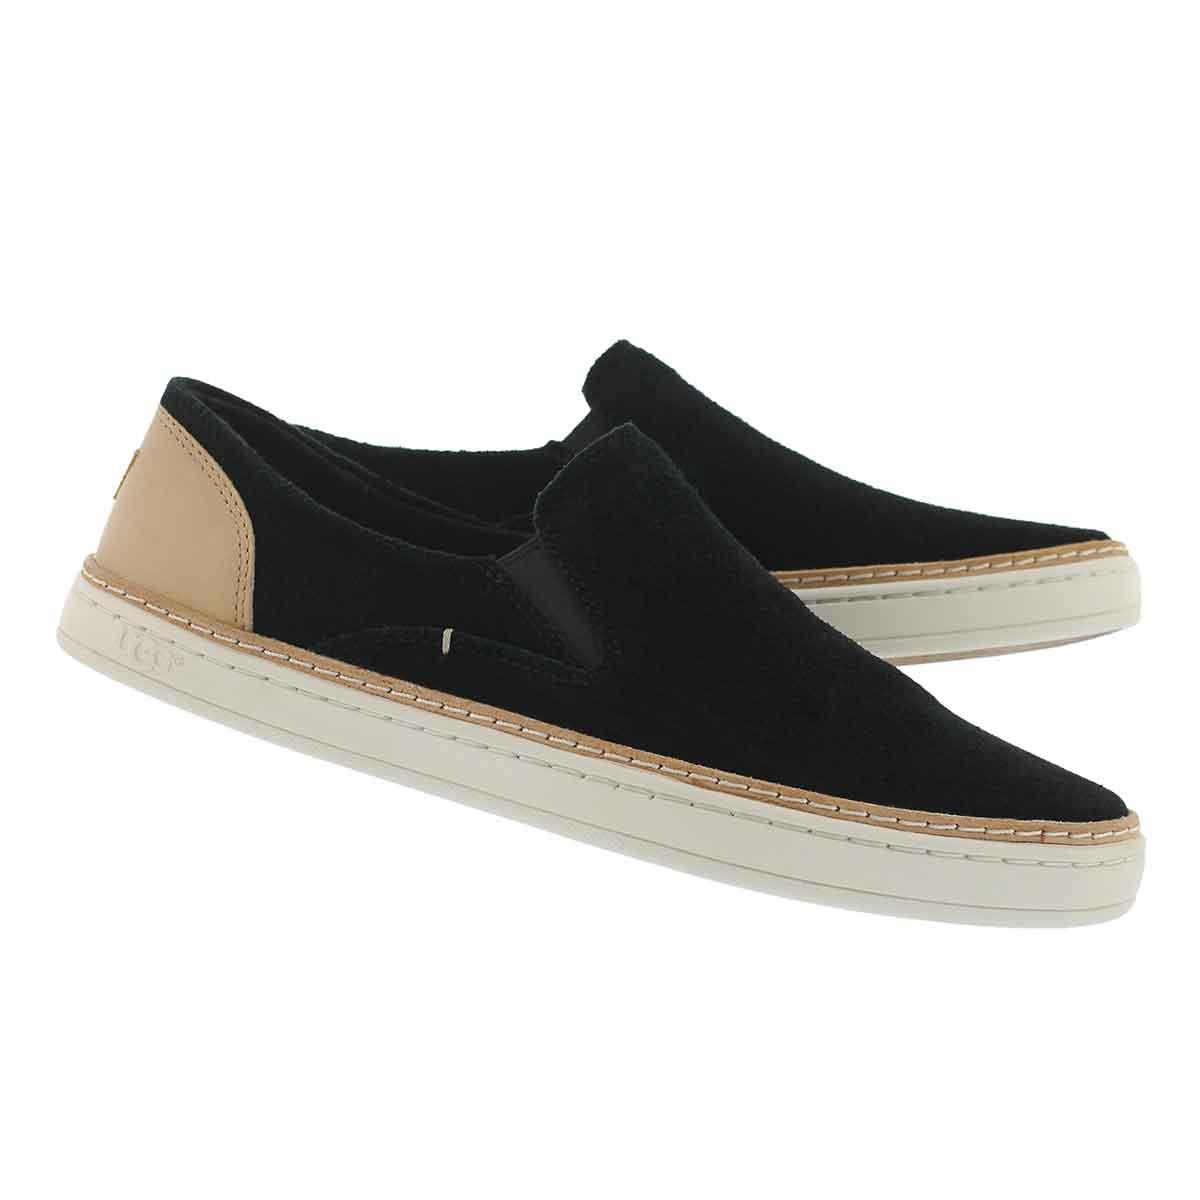 Lds Adley Perf black casual slipon